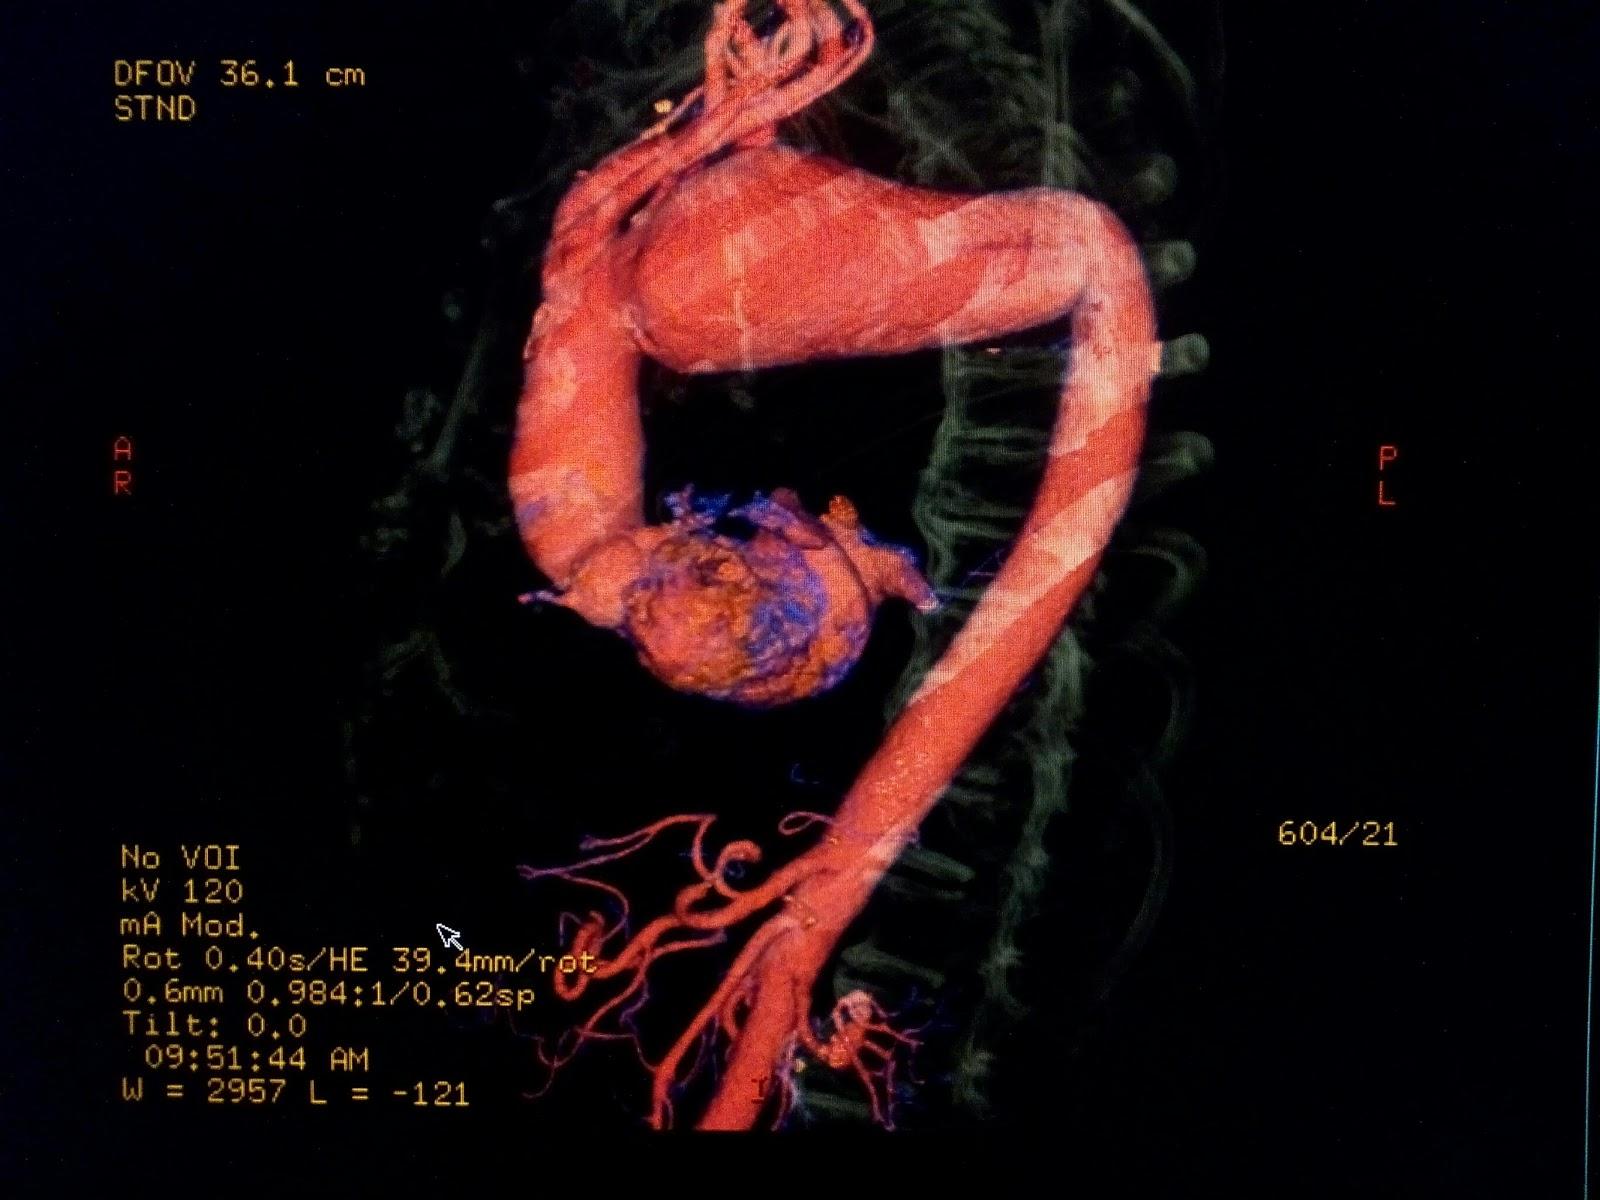 Aneurisma Arco Aortico. AngioCT   Radiodiagnóstico